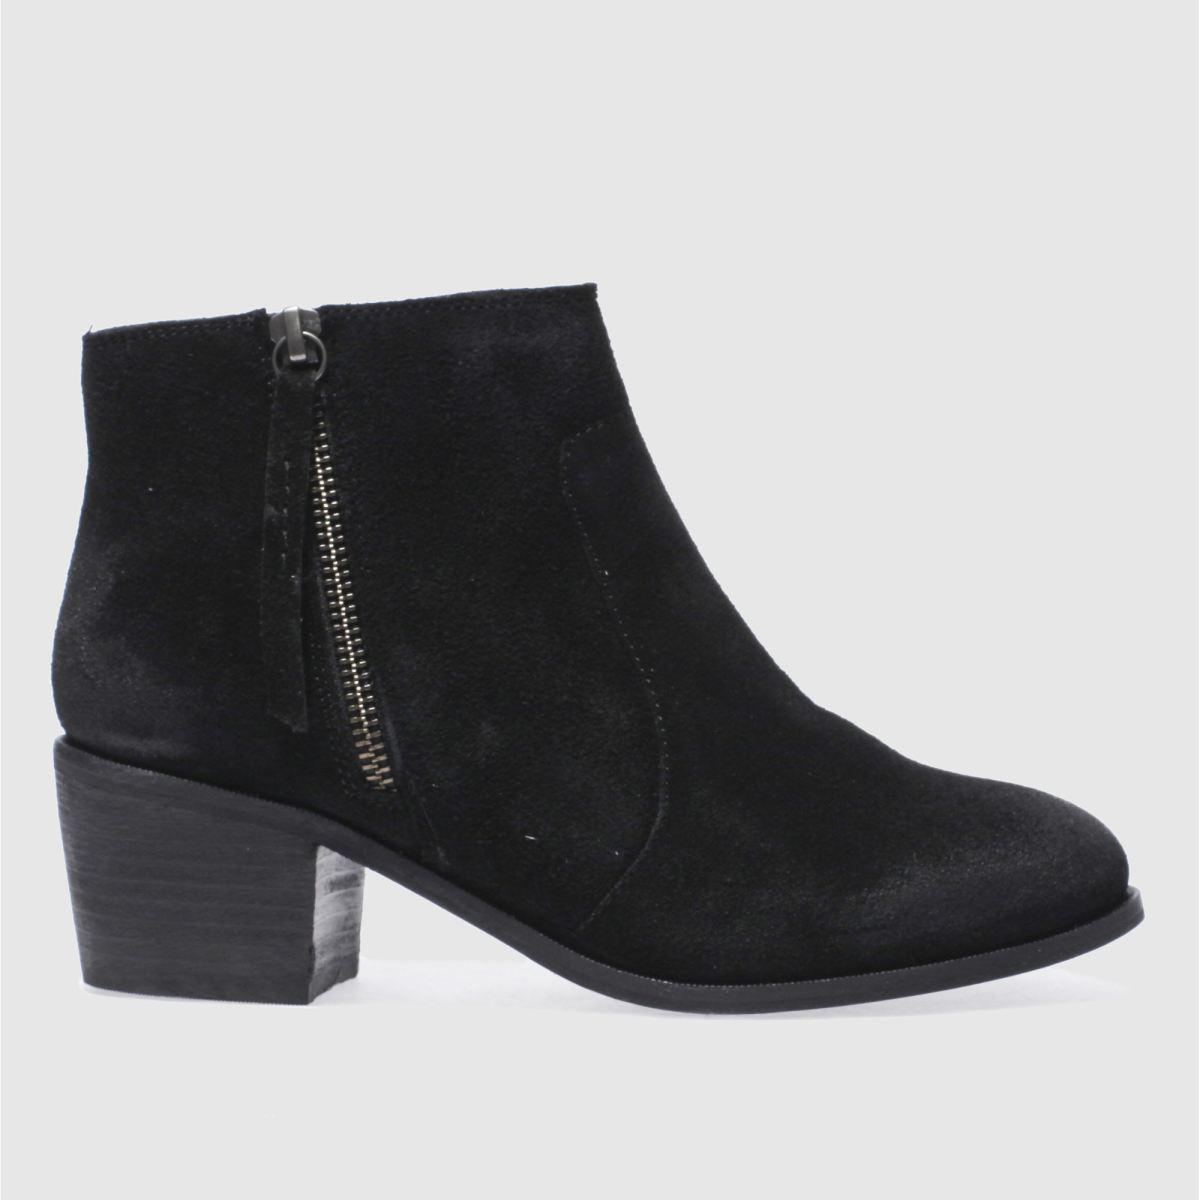 Schuh Black Jesse Boots